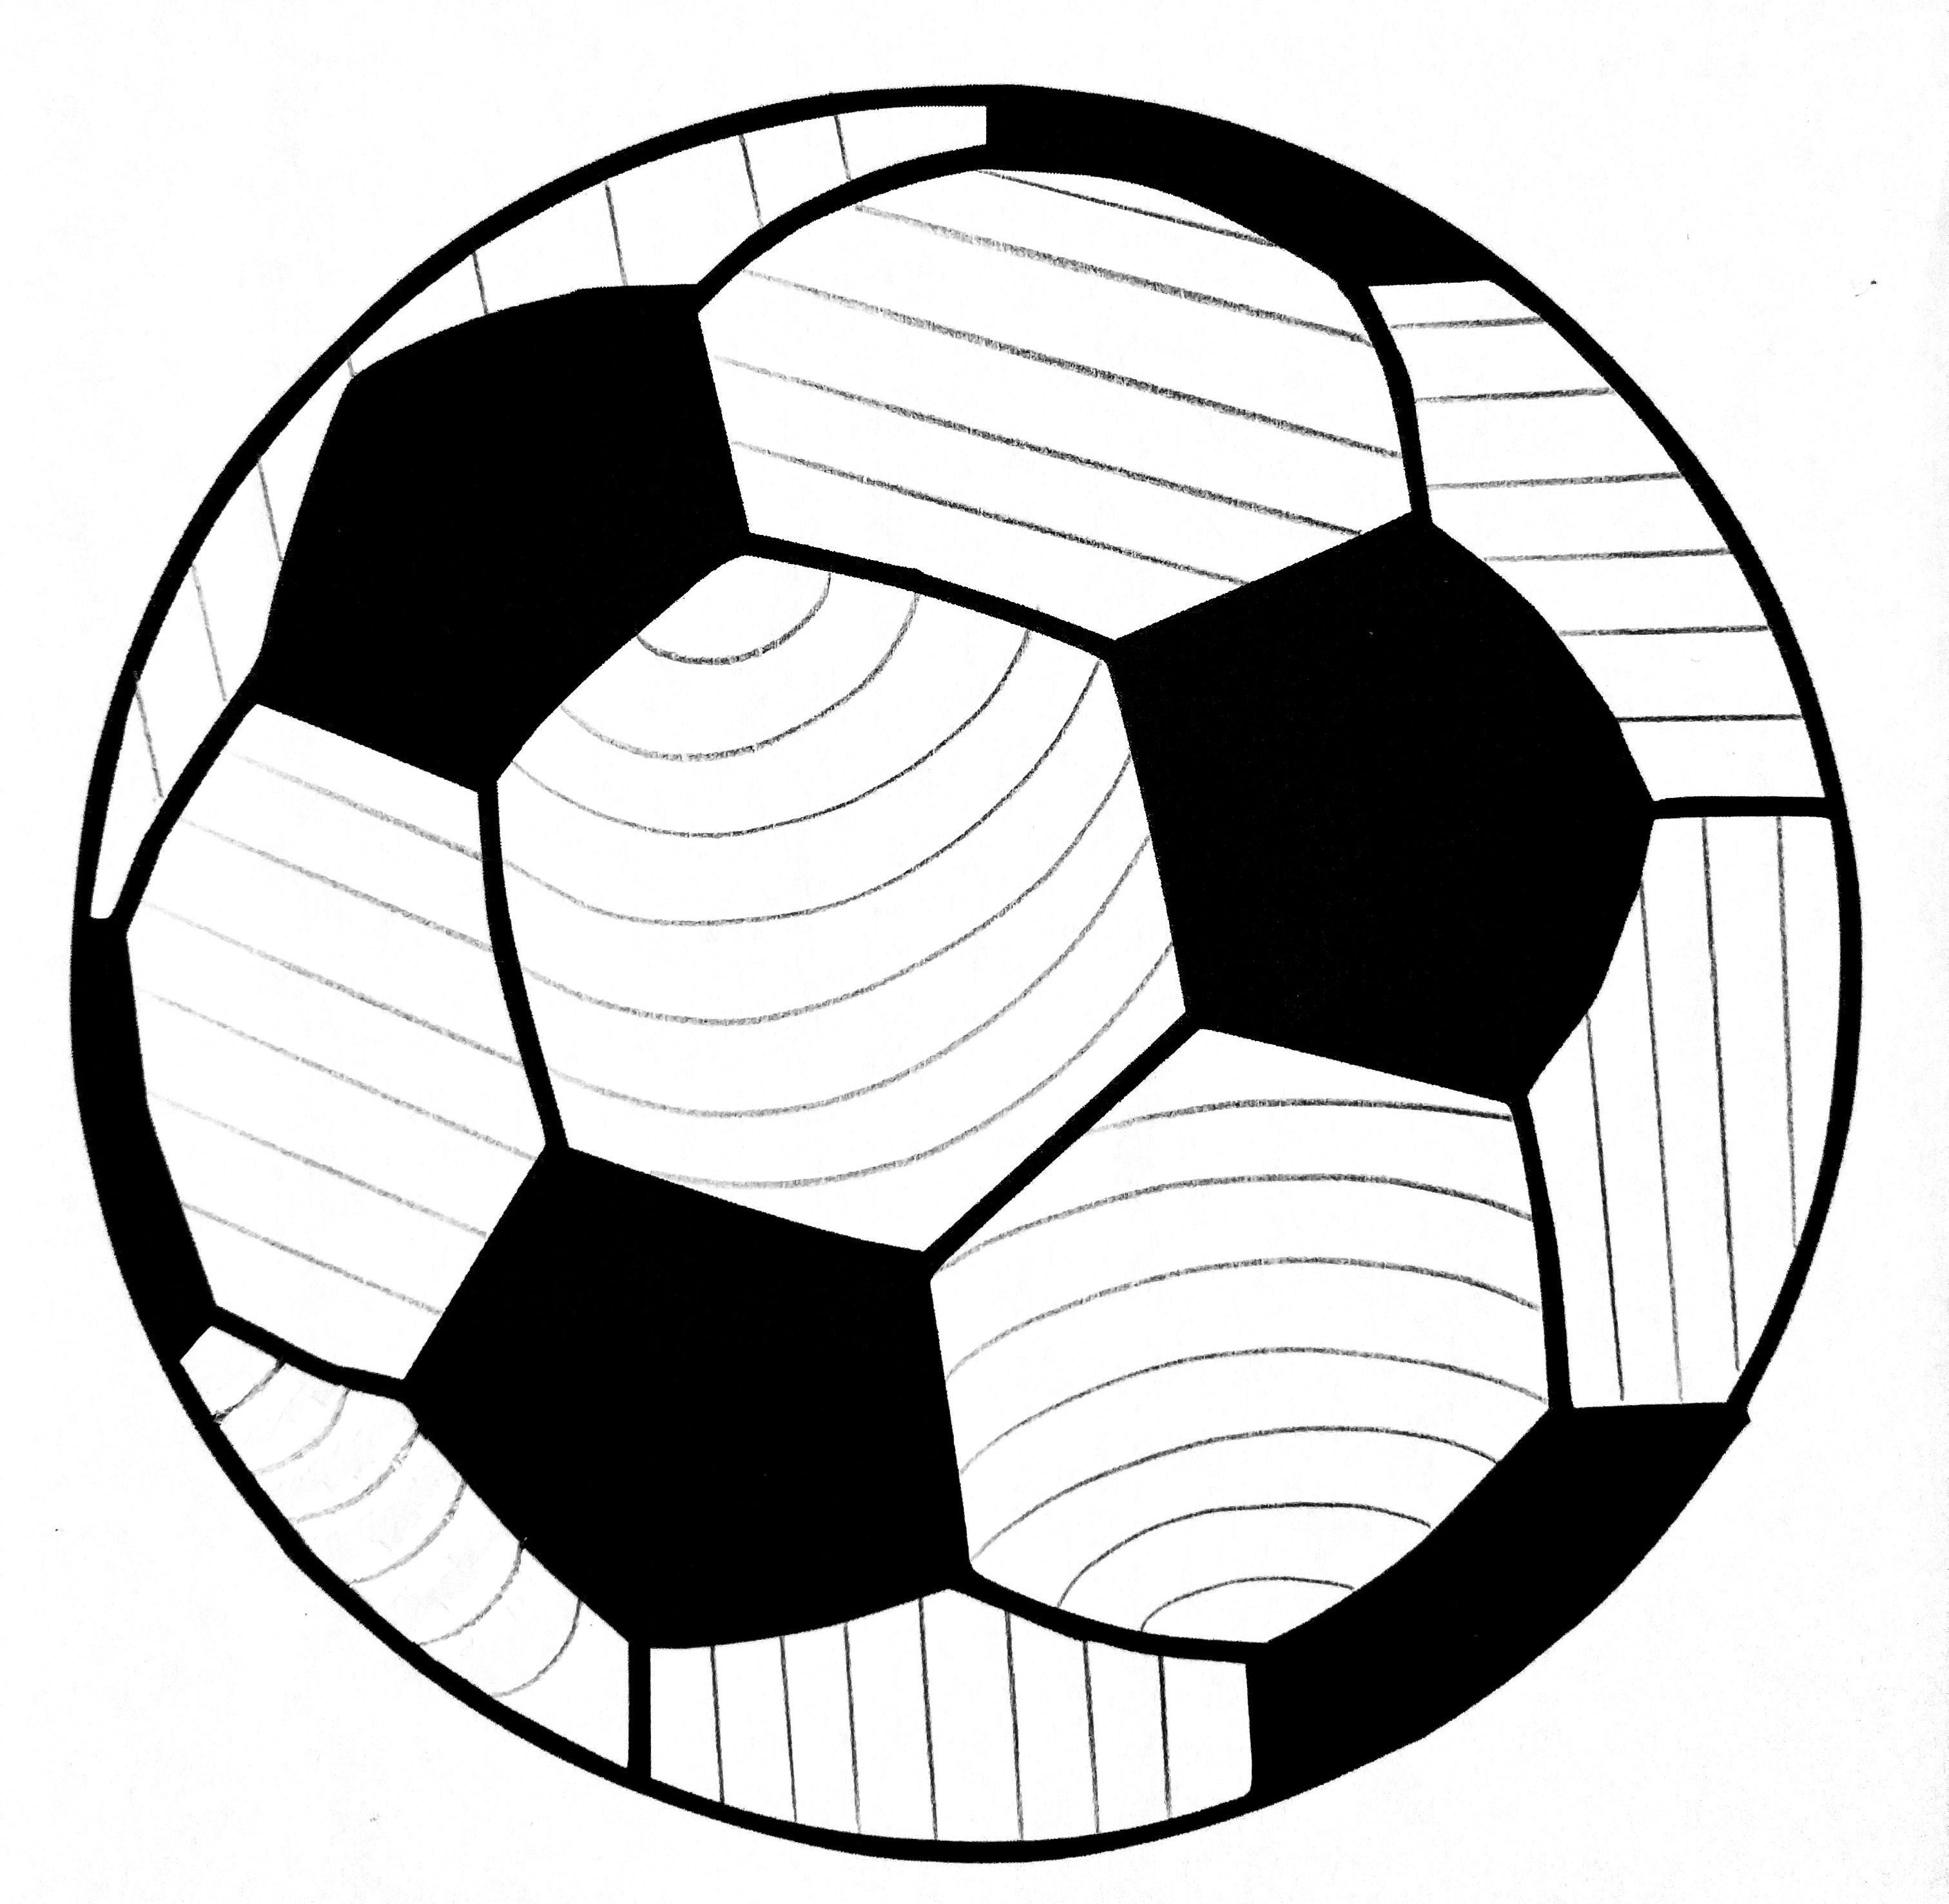 Art Et Football | Les Fourmis Créatives concernant Coloriage Equipe De Foot